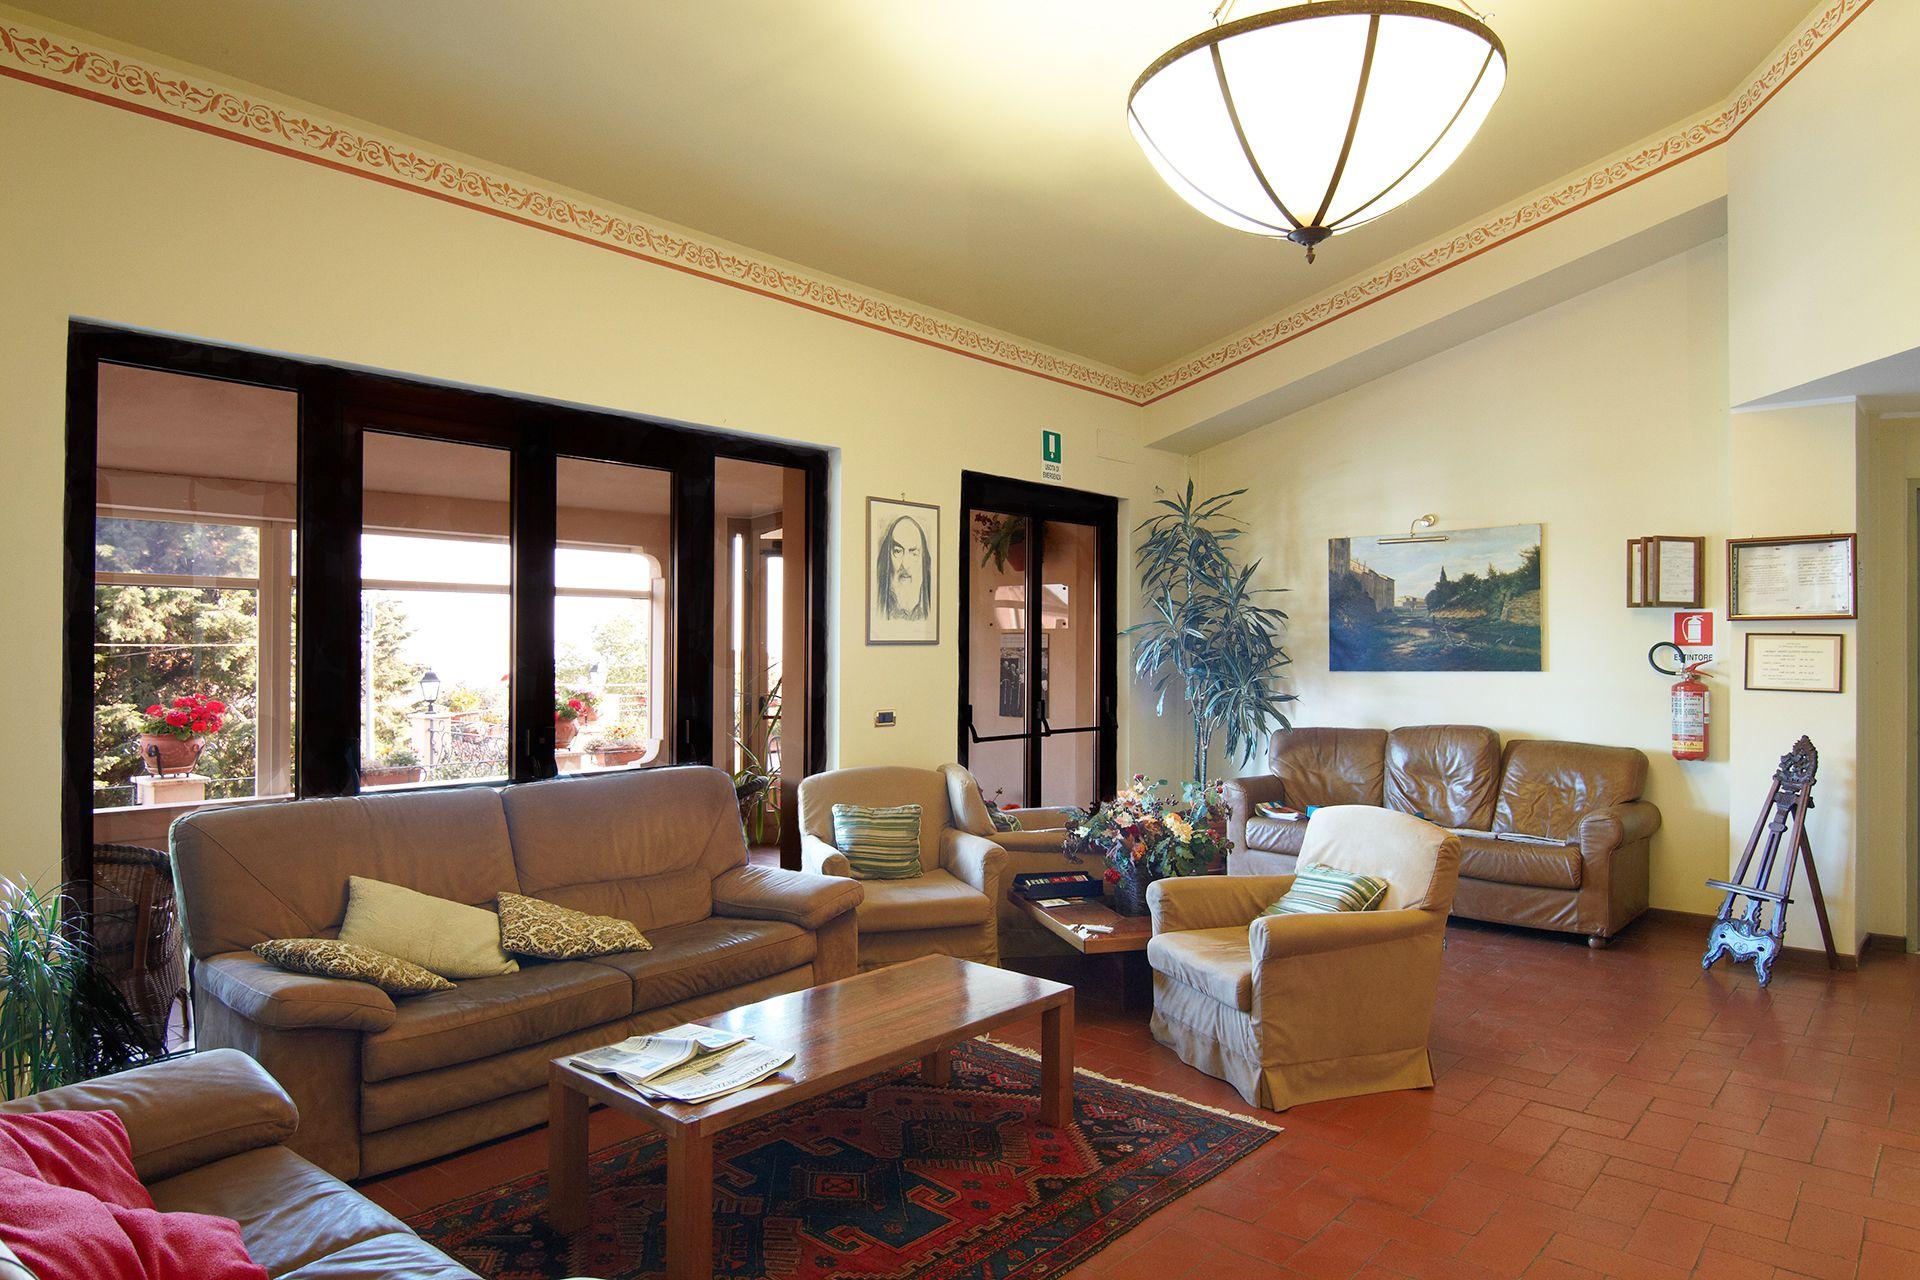 Emejing Hotel Le Terrazze Sul Gargano Contemporary - Modern Home ...